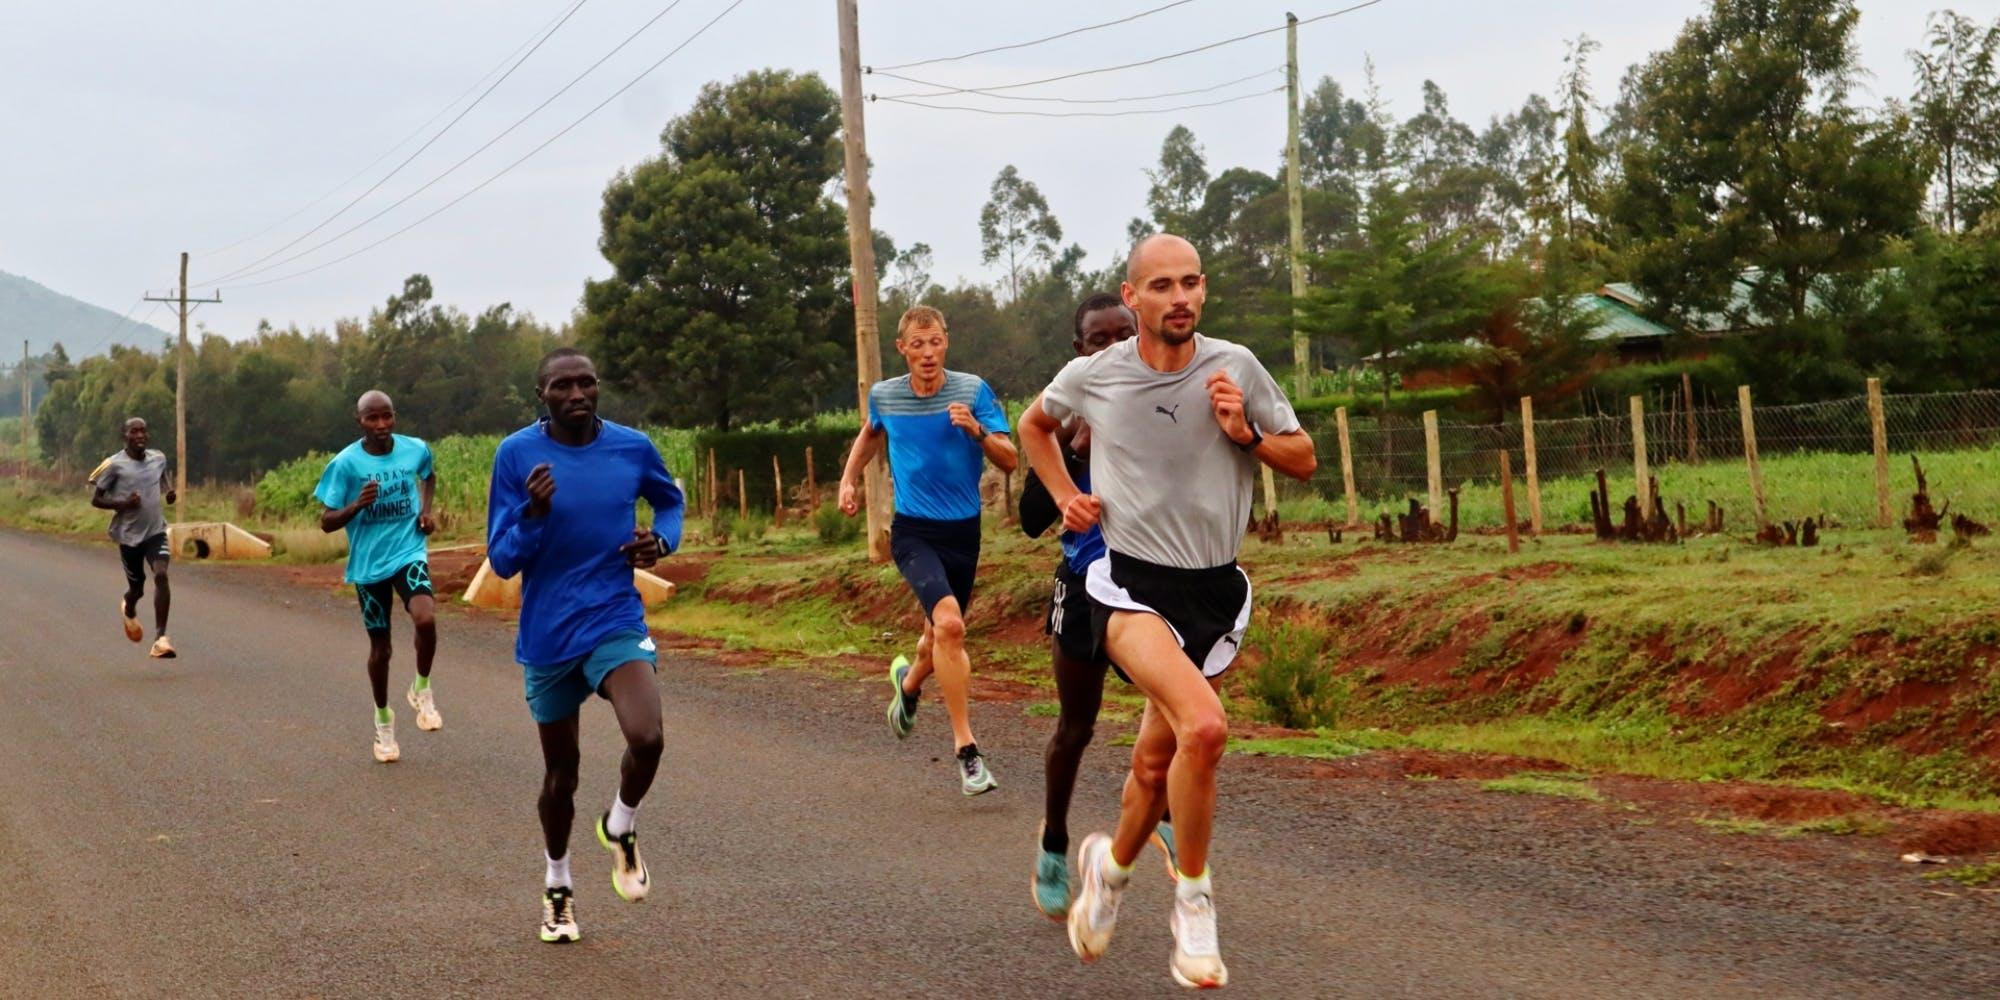 Kenya's Report: Όλες οι προπονήσεις και τα περάσματα πριν τo φορμάρισμα των δυο Γερμανών που θα τρέξουν στο Μαραθώνιο του Τόκιο